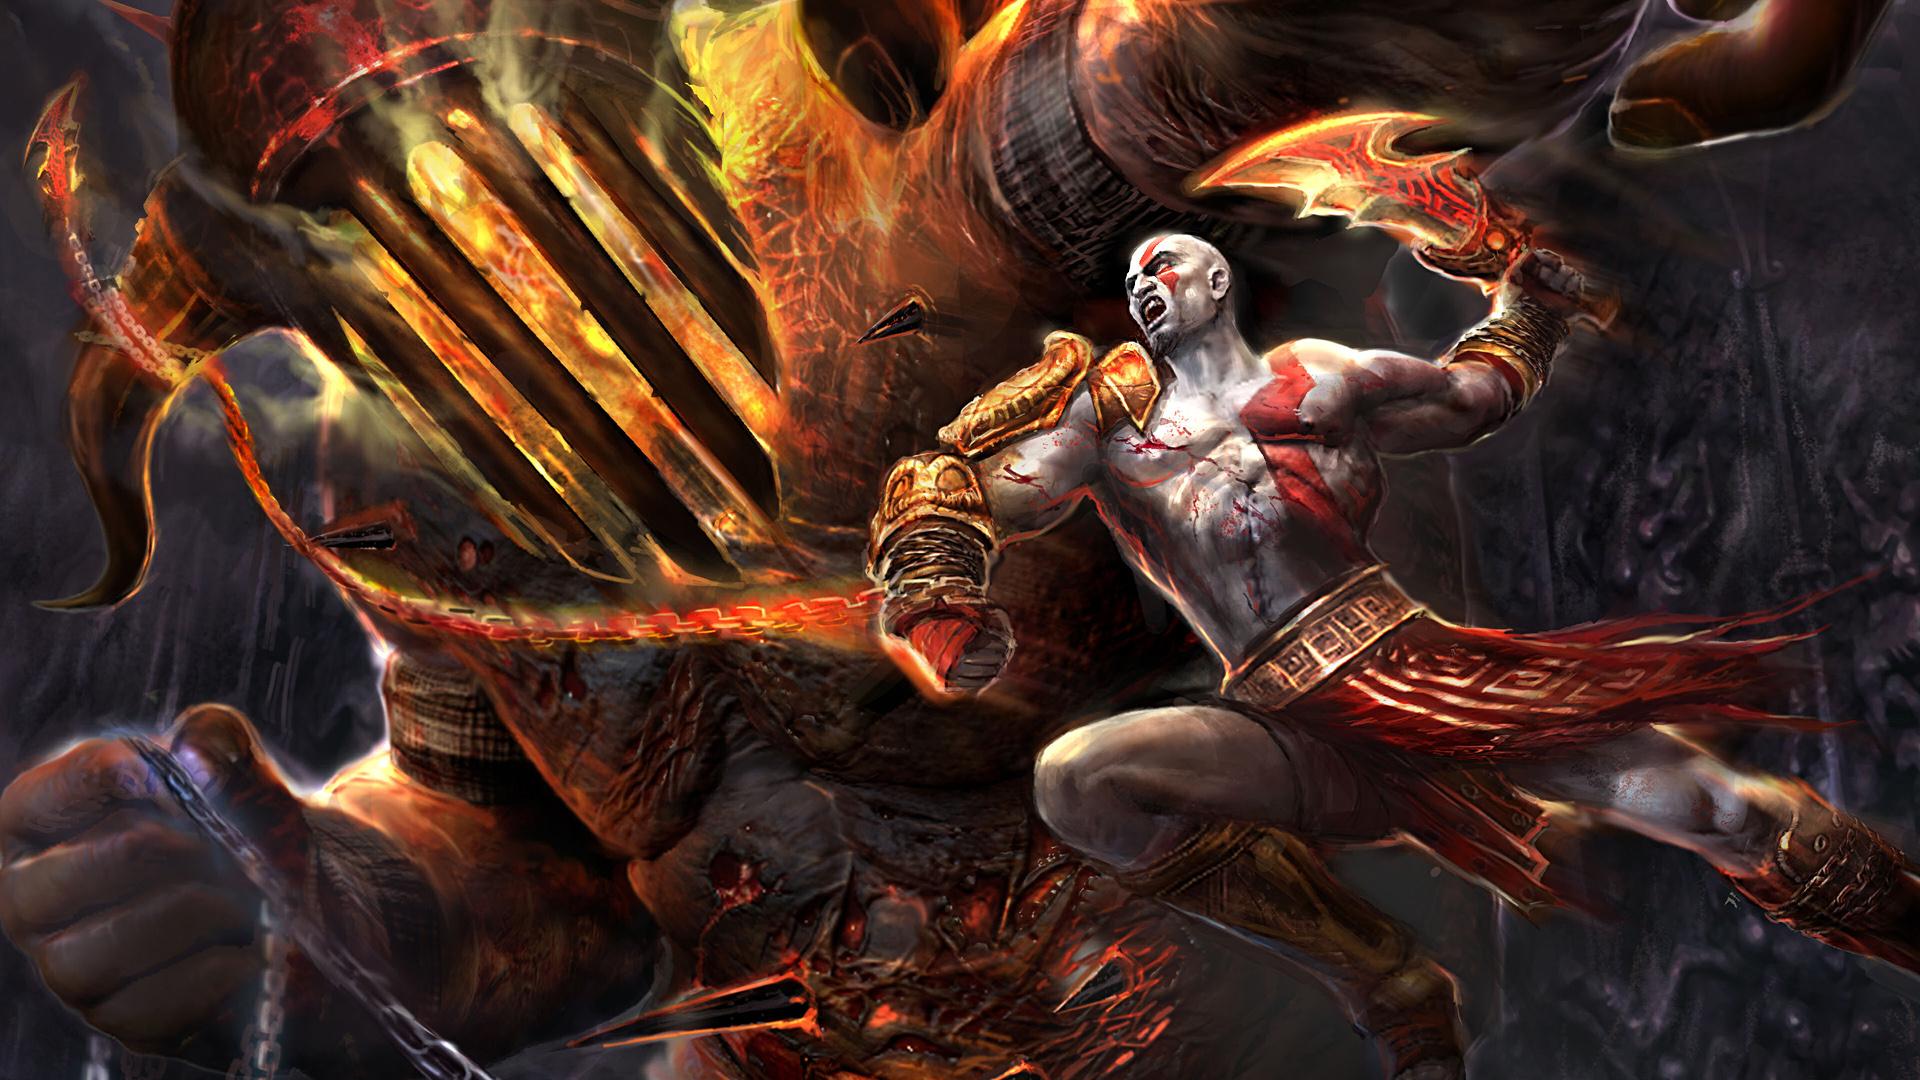 God of war iii hd wallpaper background image 1920x1080 id 84243 wallpaper abyss - Wallpaper kratos ...